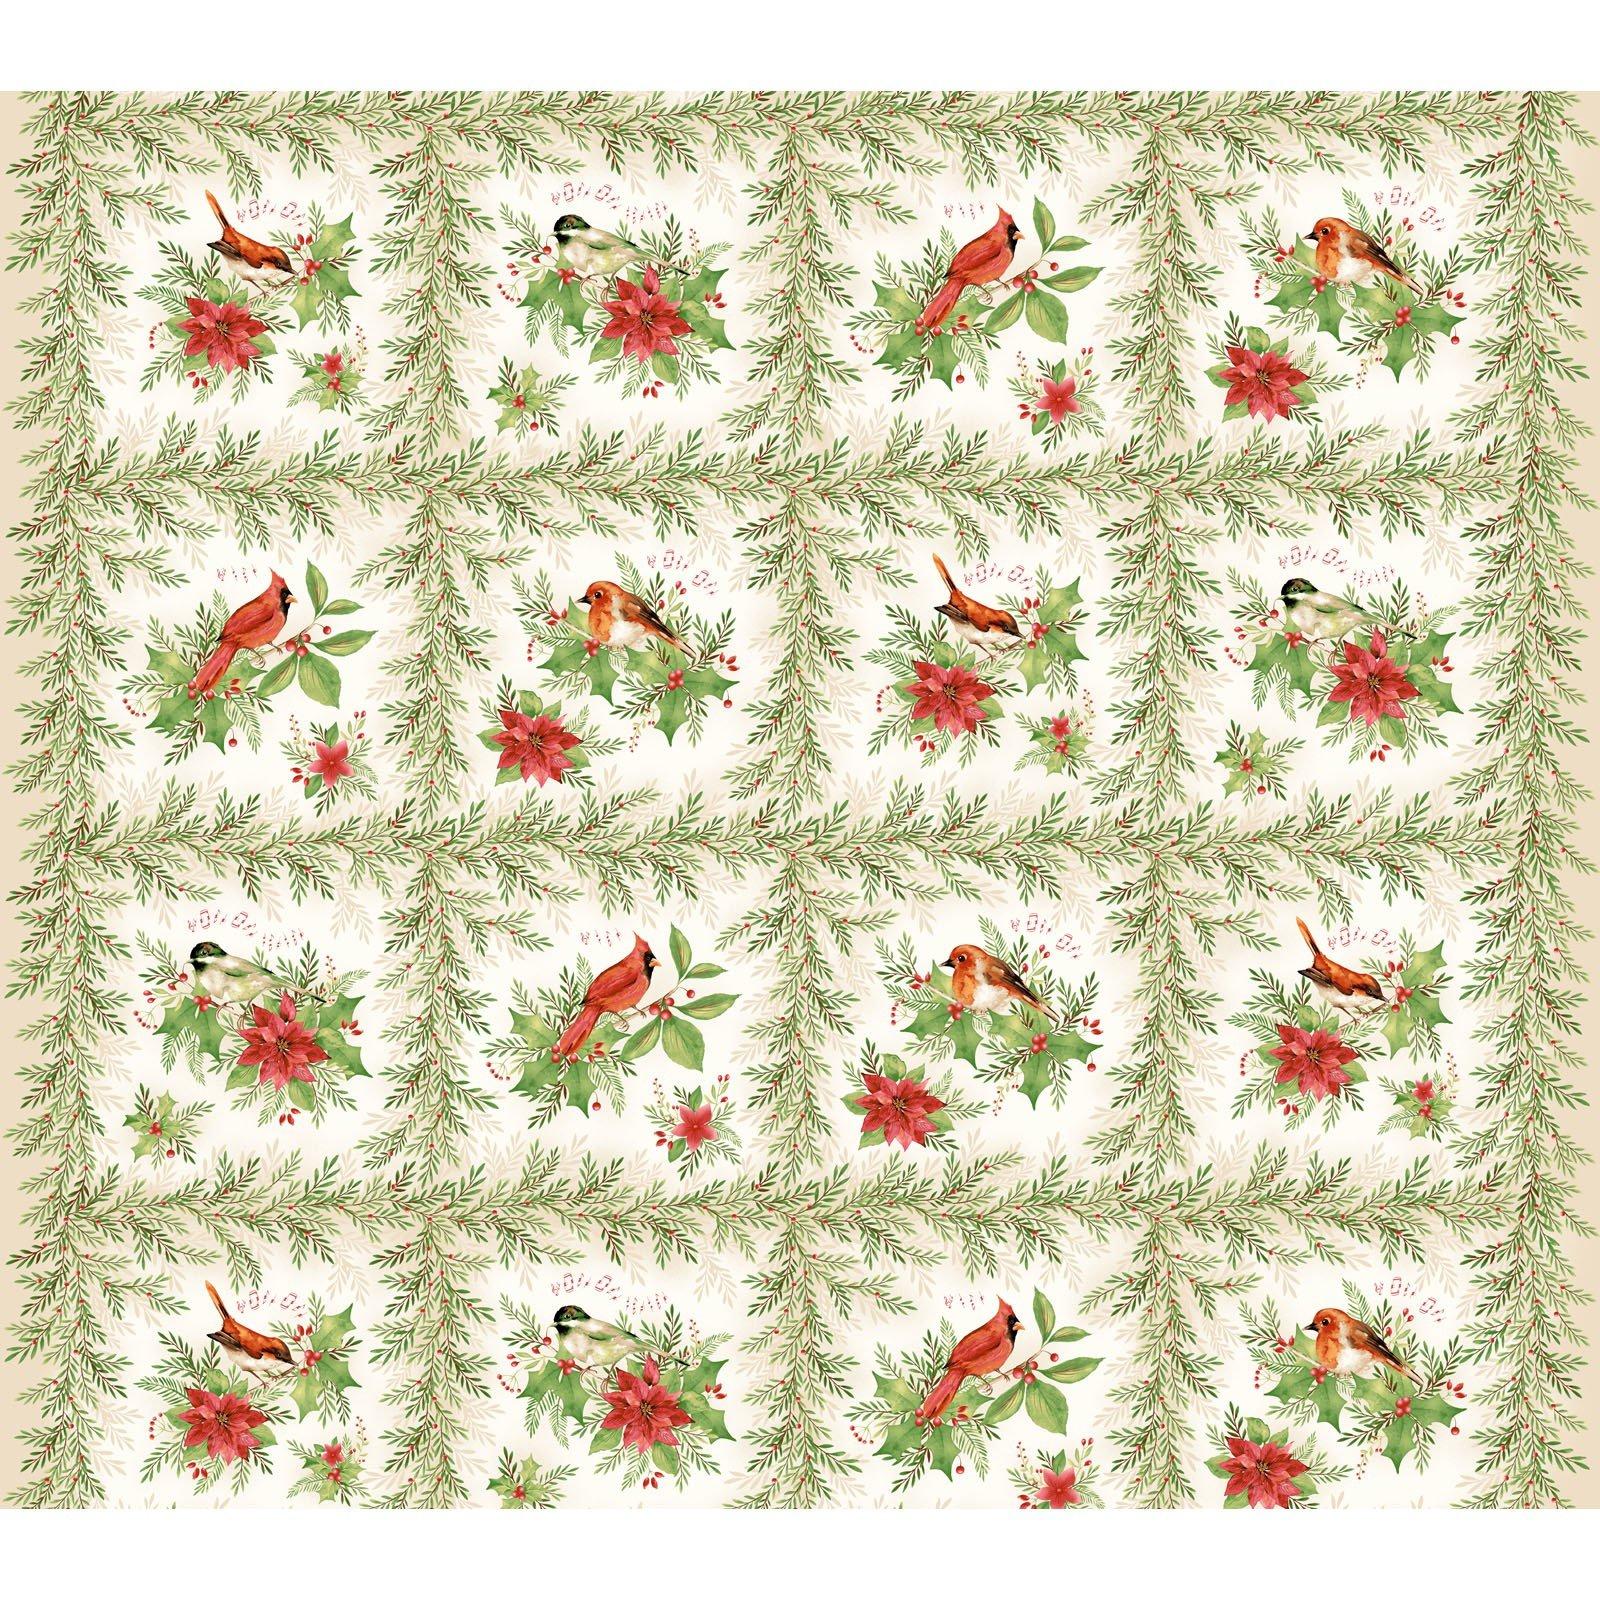 Songbird Christmas panel